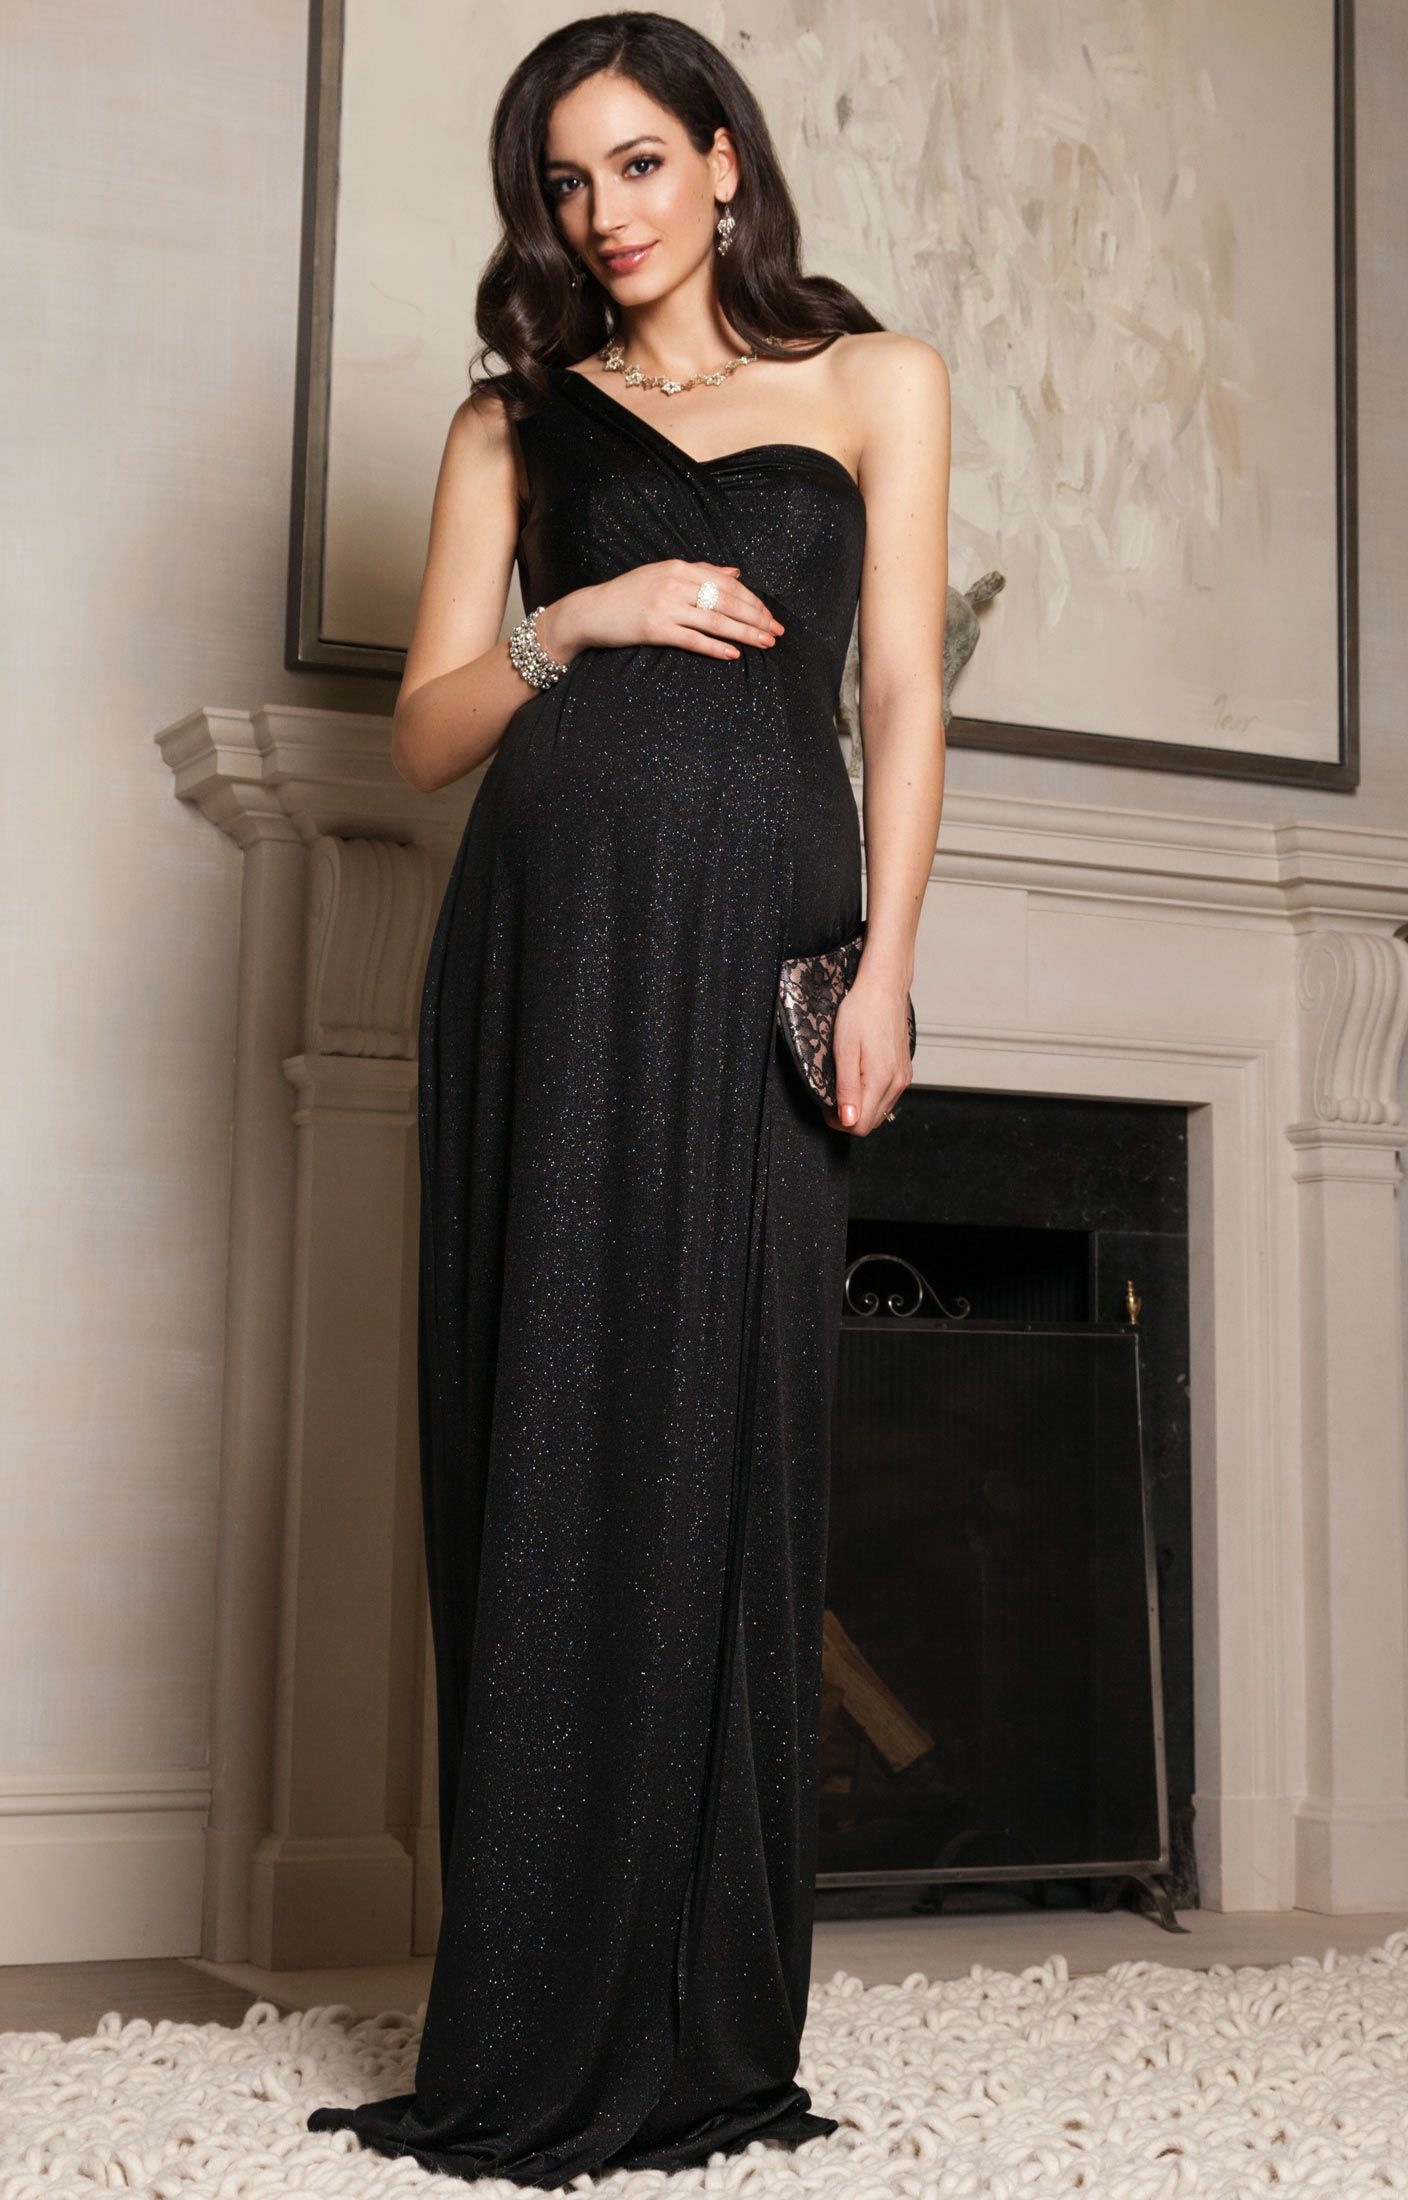 4427abe2e1d Maternity Dress For Black Tie Wedding - Gomes Weine AG